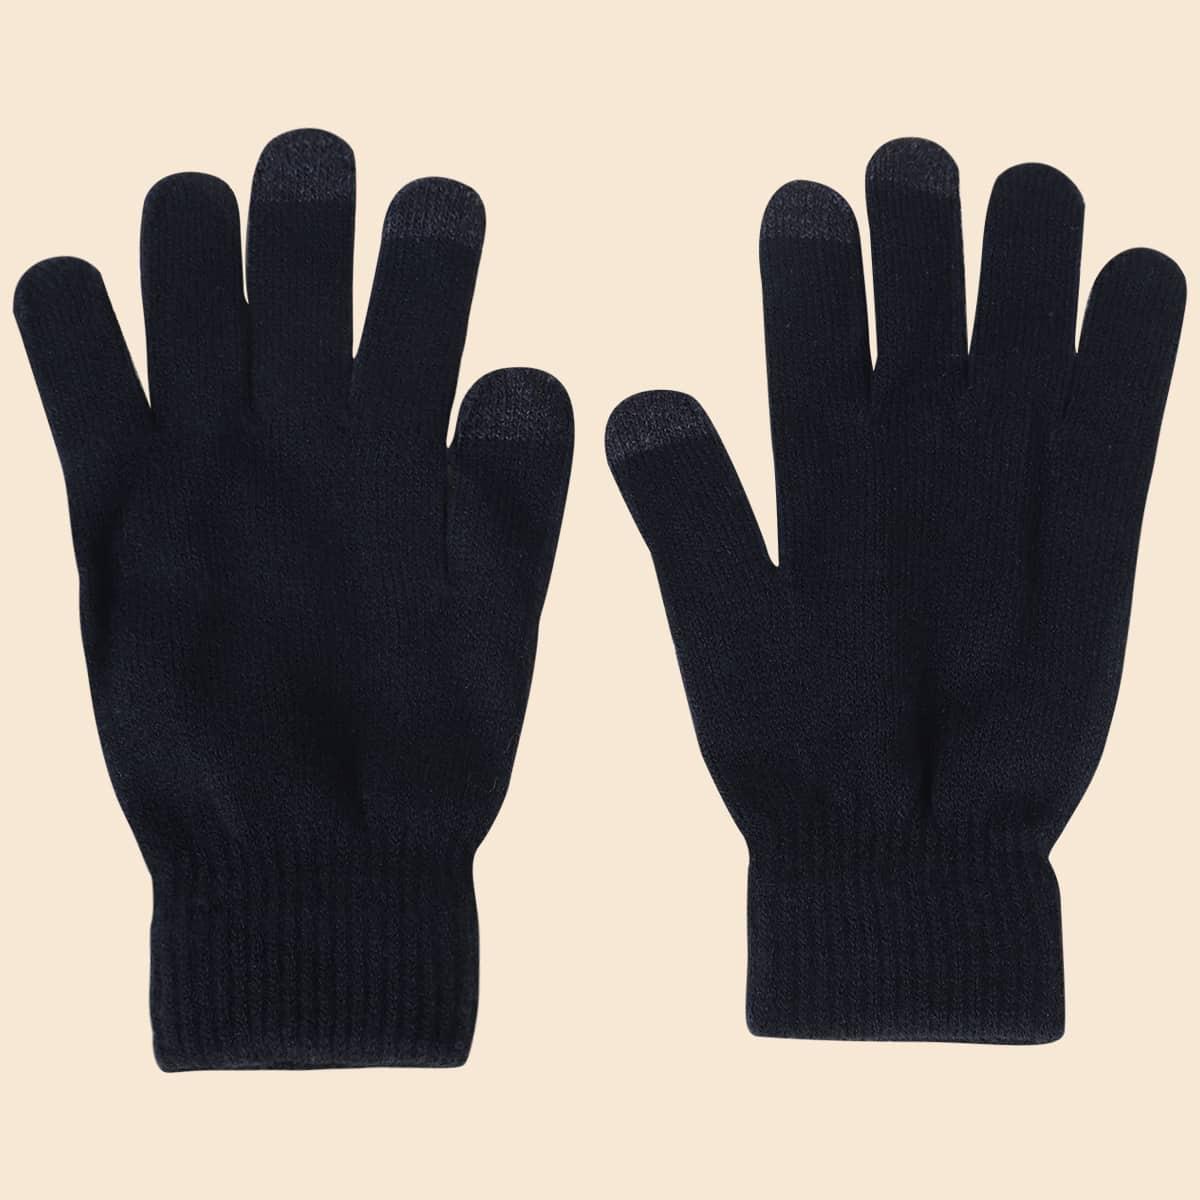 Männer Strick Fünf-Fingerhandschuhe